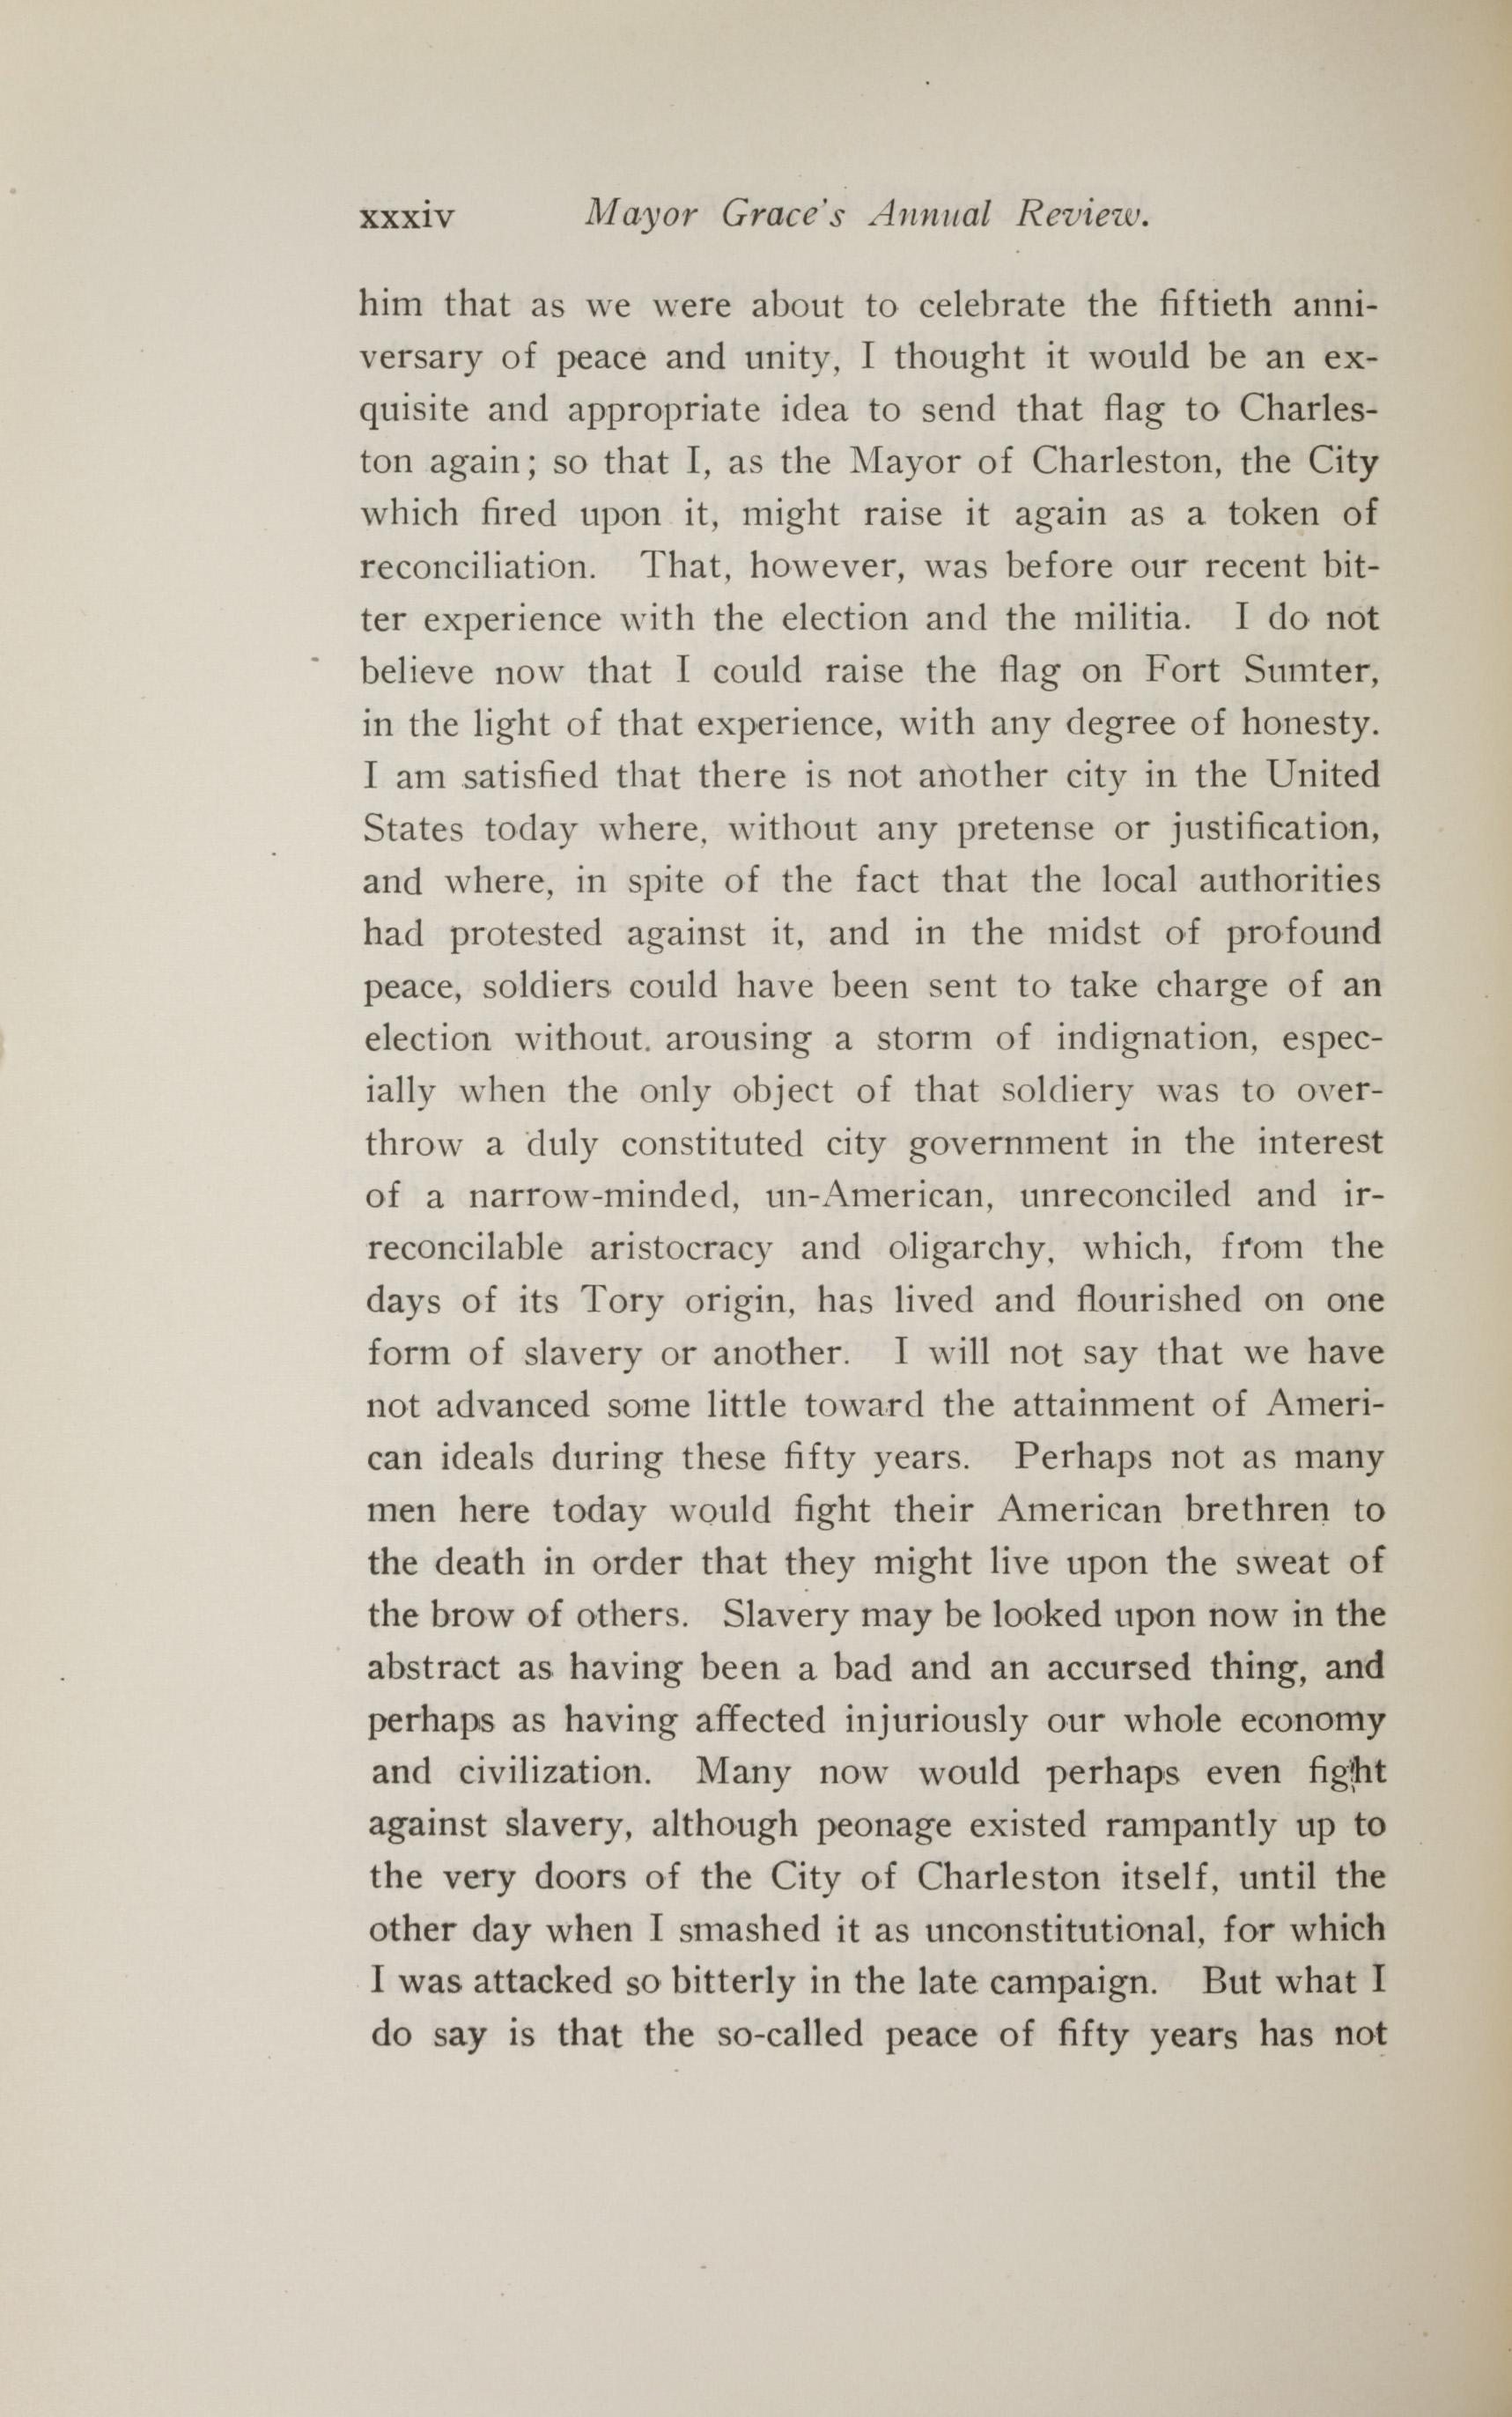 Charleston Yearbook, 1914, page xxxiv